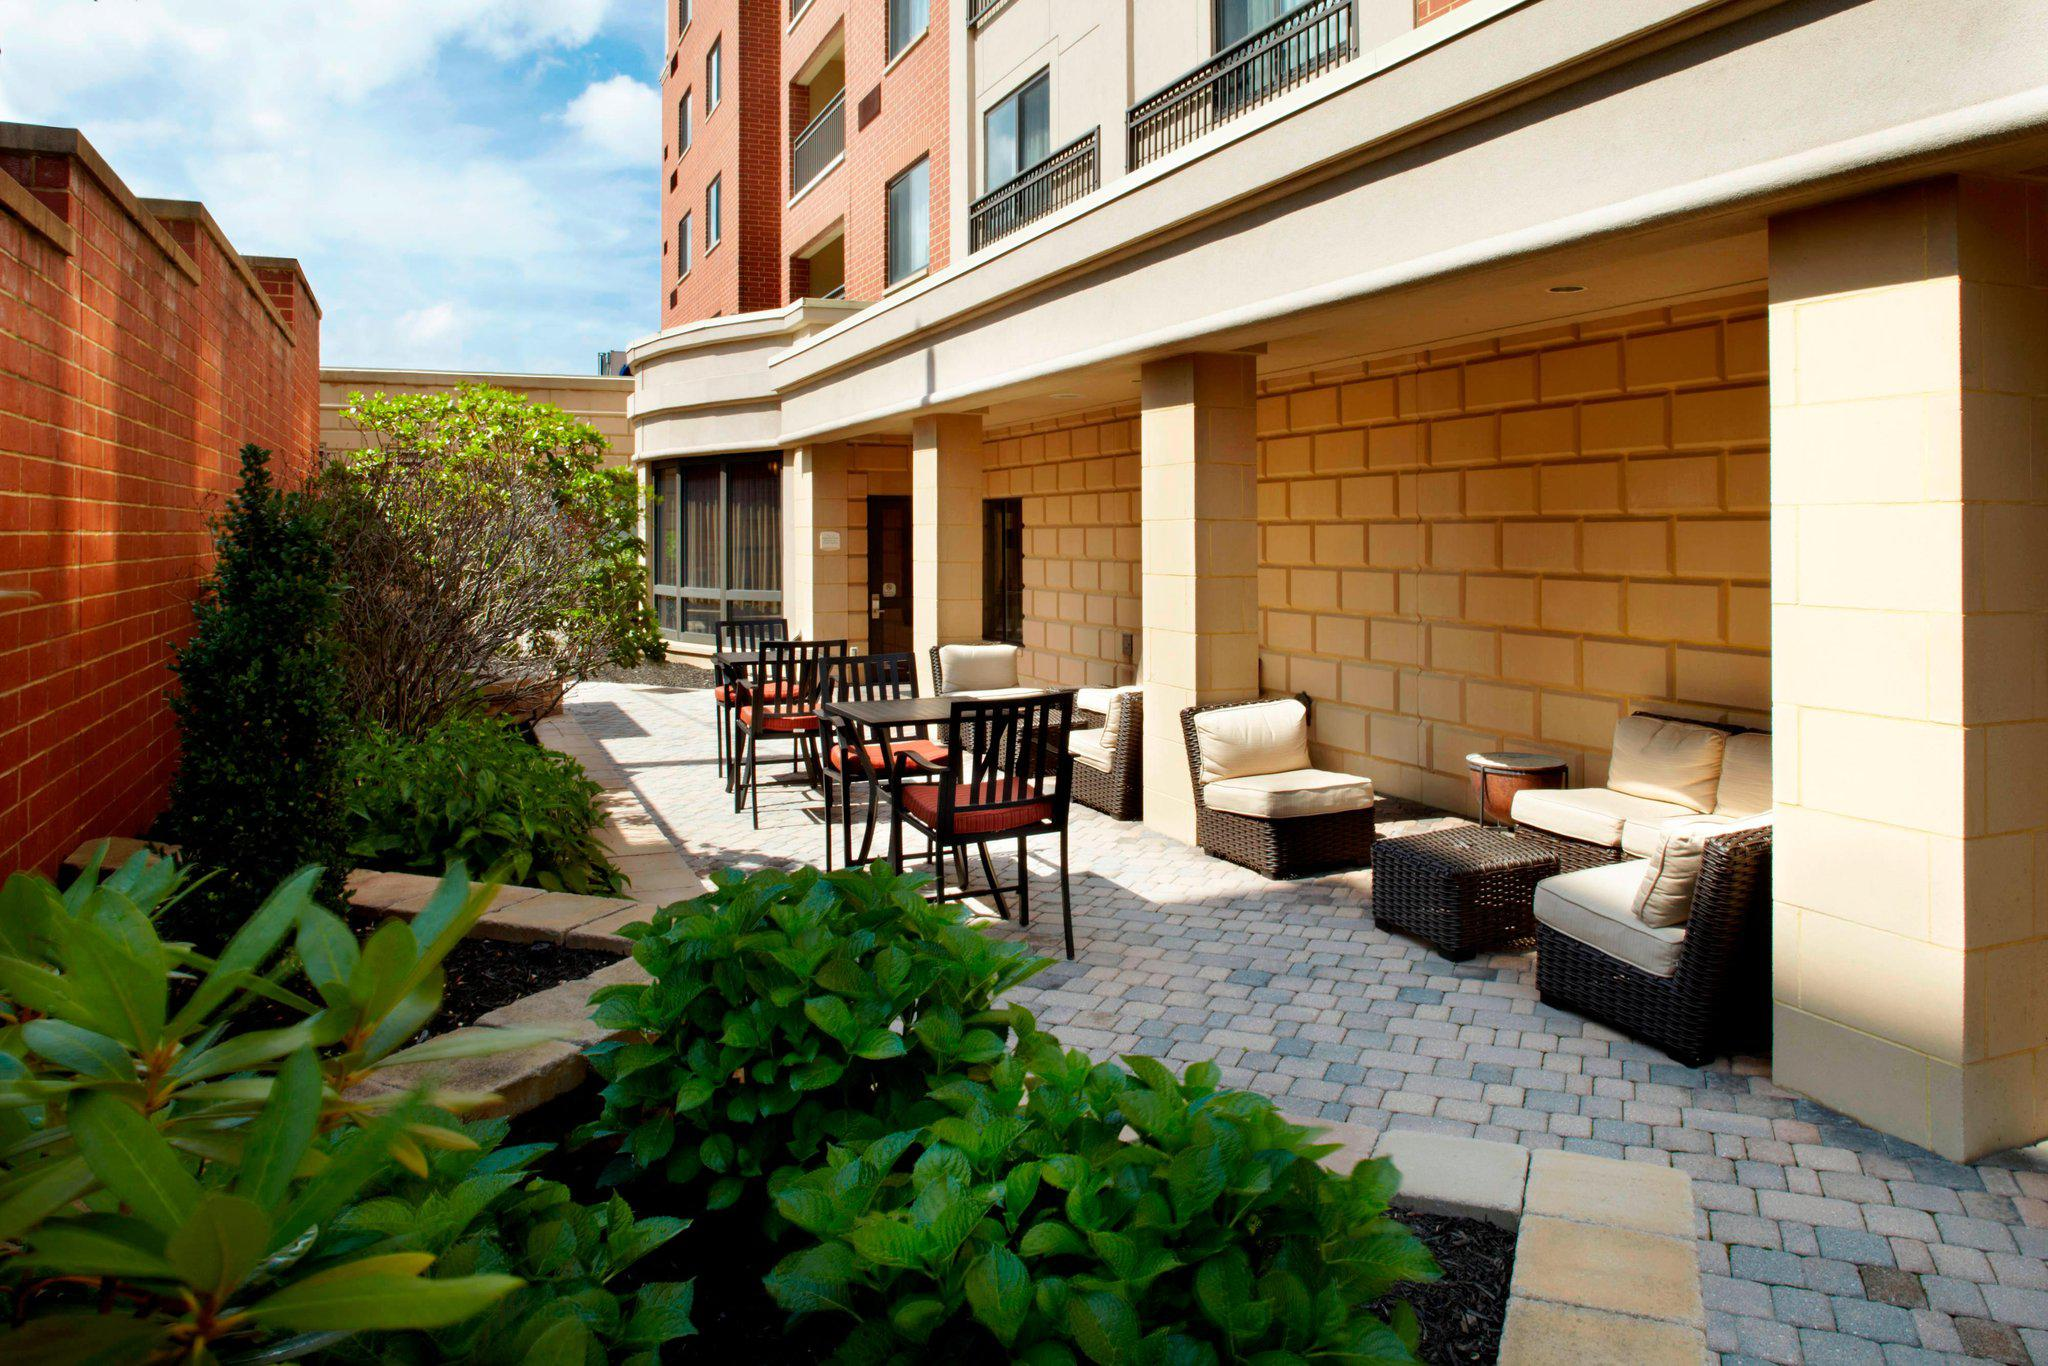 Courtyard by Marriott Pittsburgh Shadyside